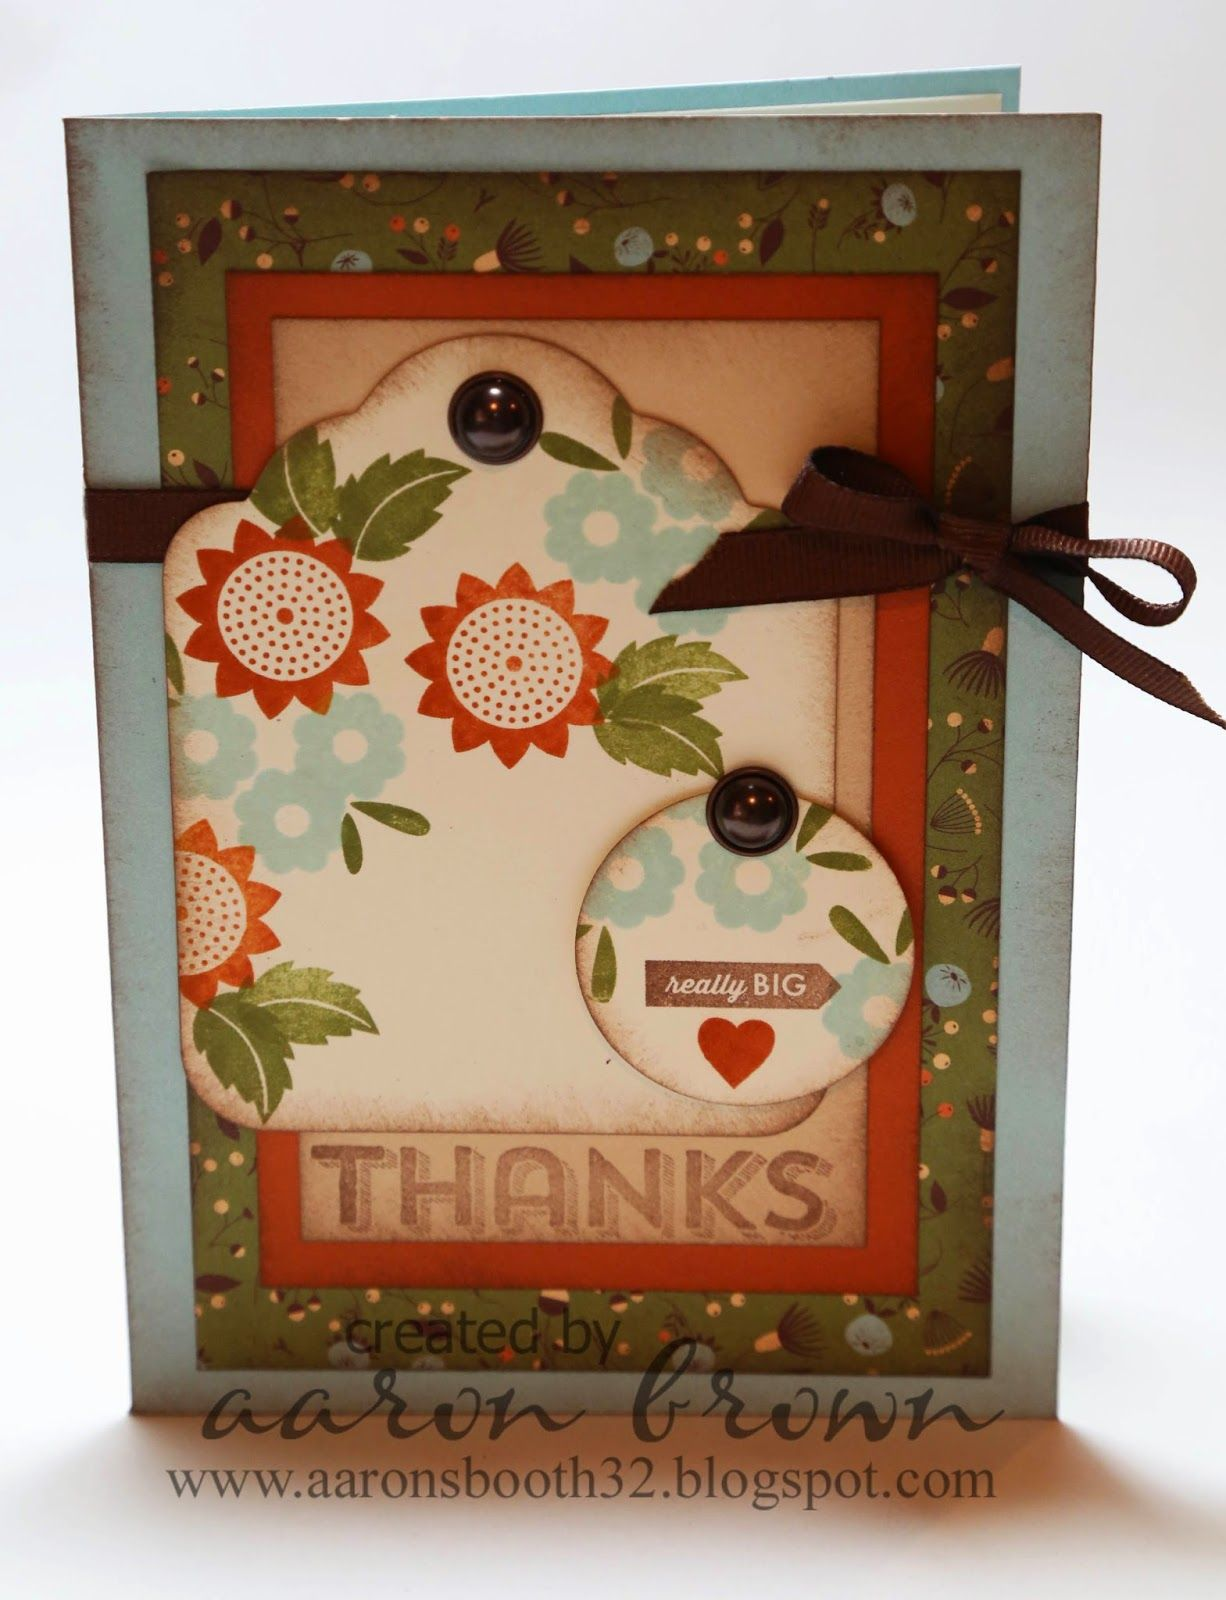 Booth #32: Pin Inspired Thanks Card #Pathfinding #CardmakingWOTG